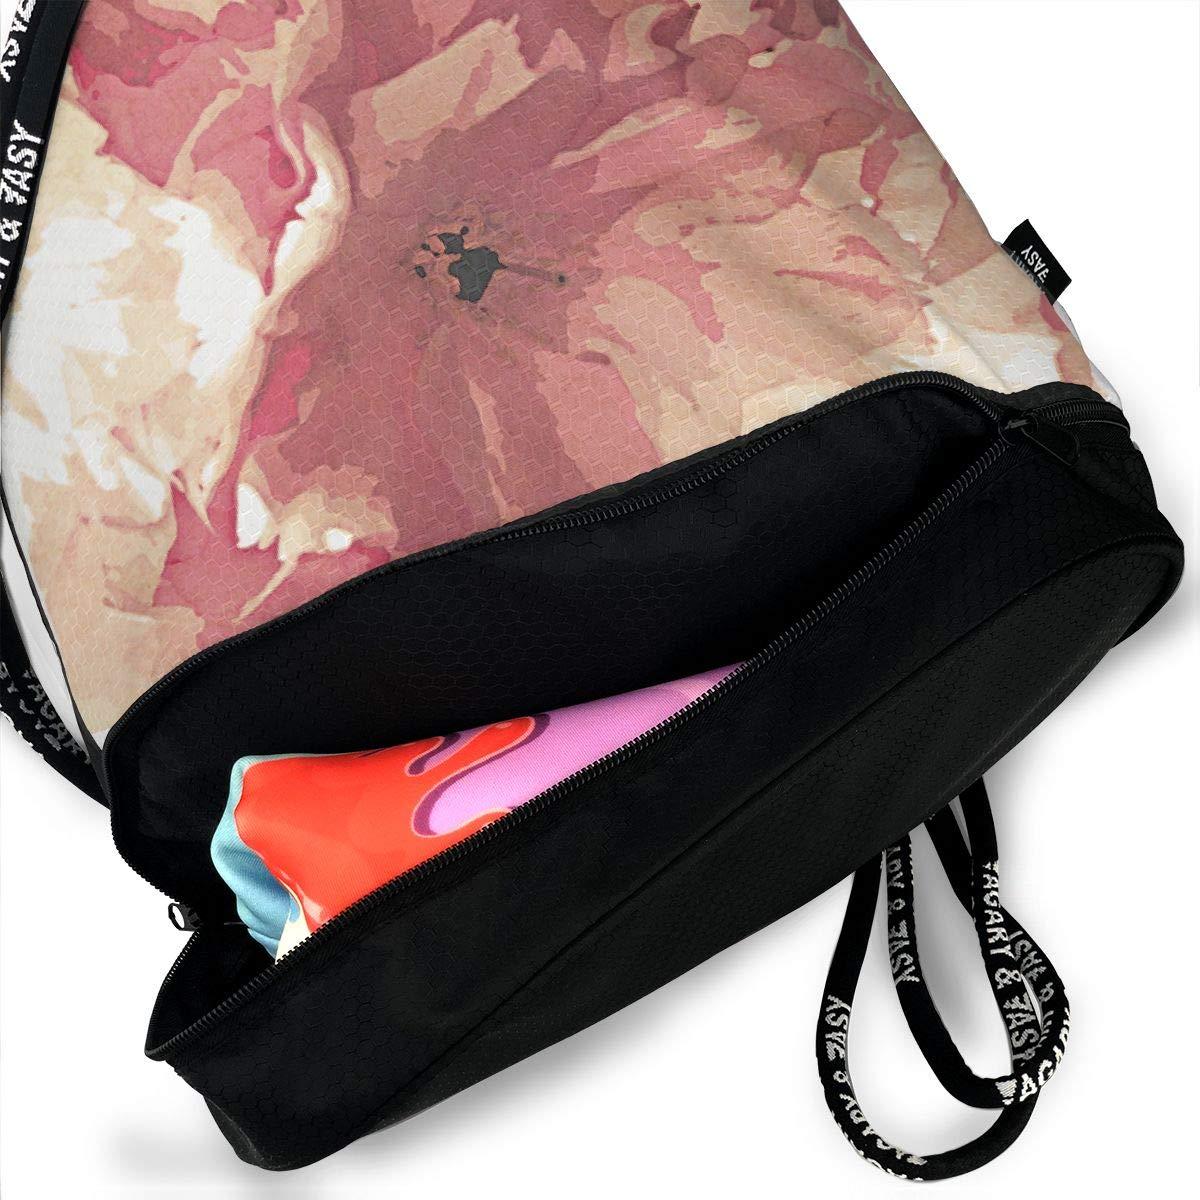 Pink Prunus Tea Towel Spring Drawstring Backpack Sports Athletic Gym Cinch Sack String Storage Bags for Hiking Travel Beach